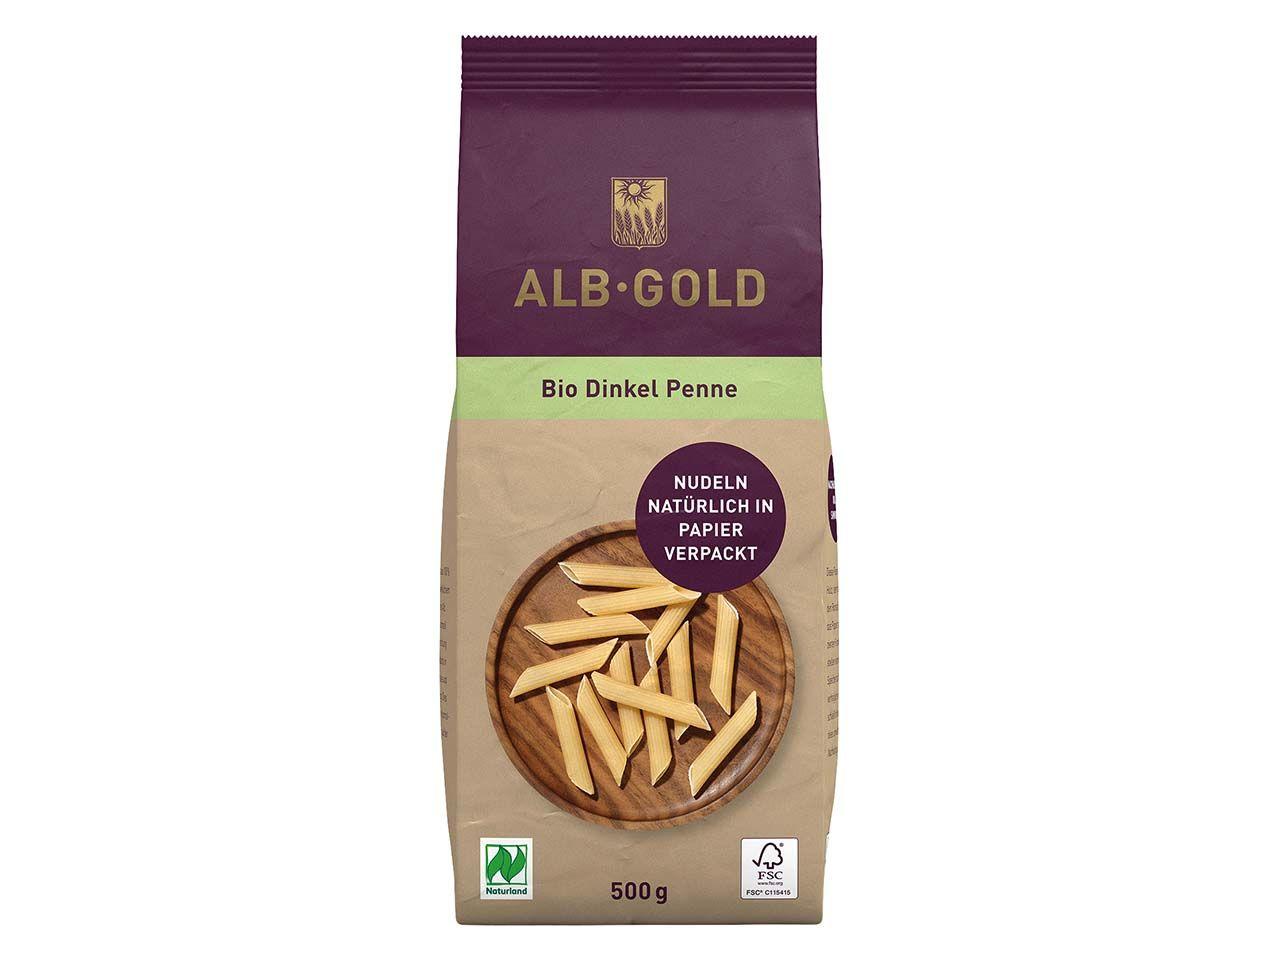 ALB-GOLD Bio-Dinkel Penne, 500 g 104034314